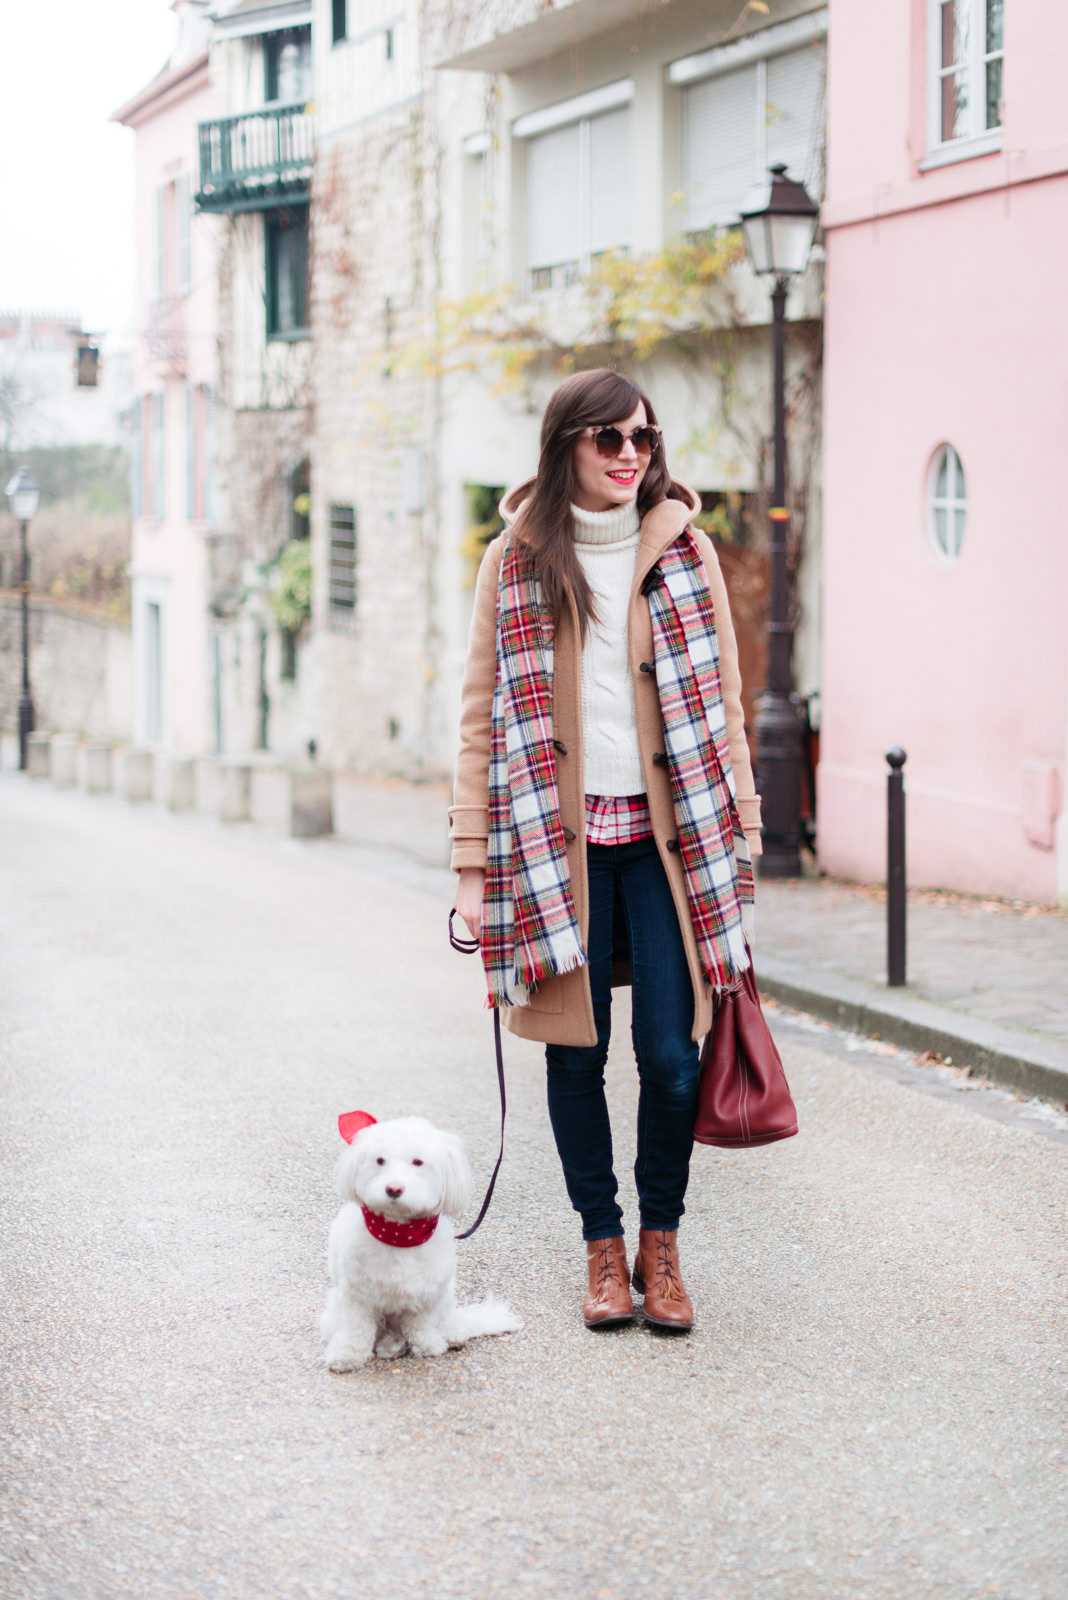 Blog-Mode-And-The-City-Looks-La-Maison-Rose-3